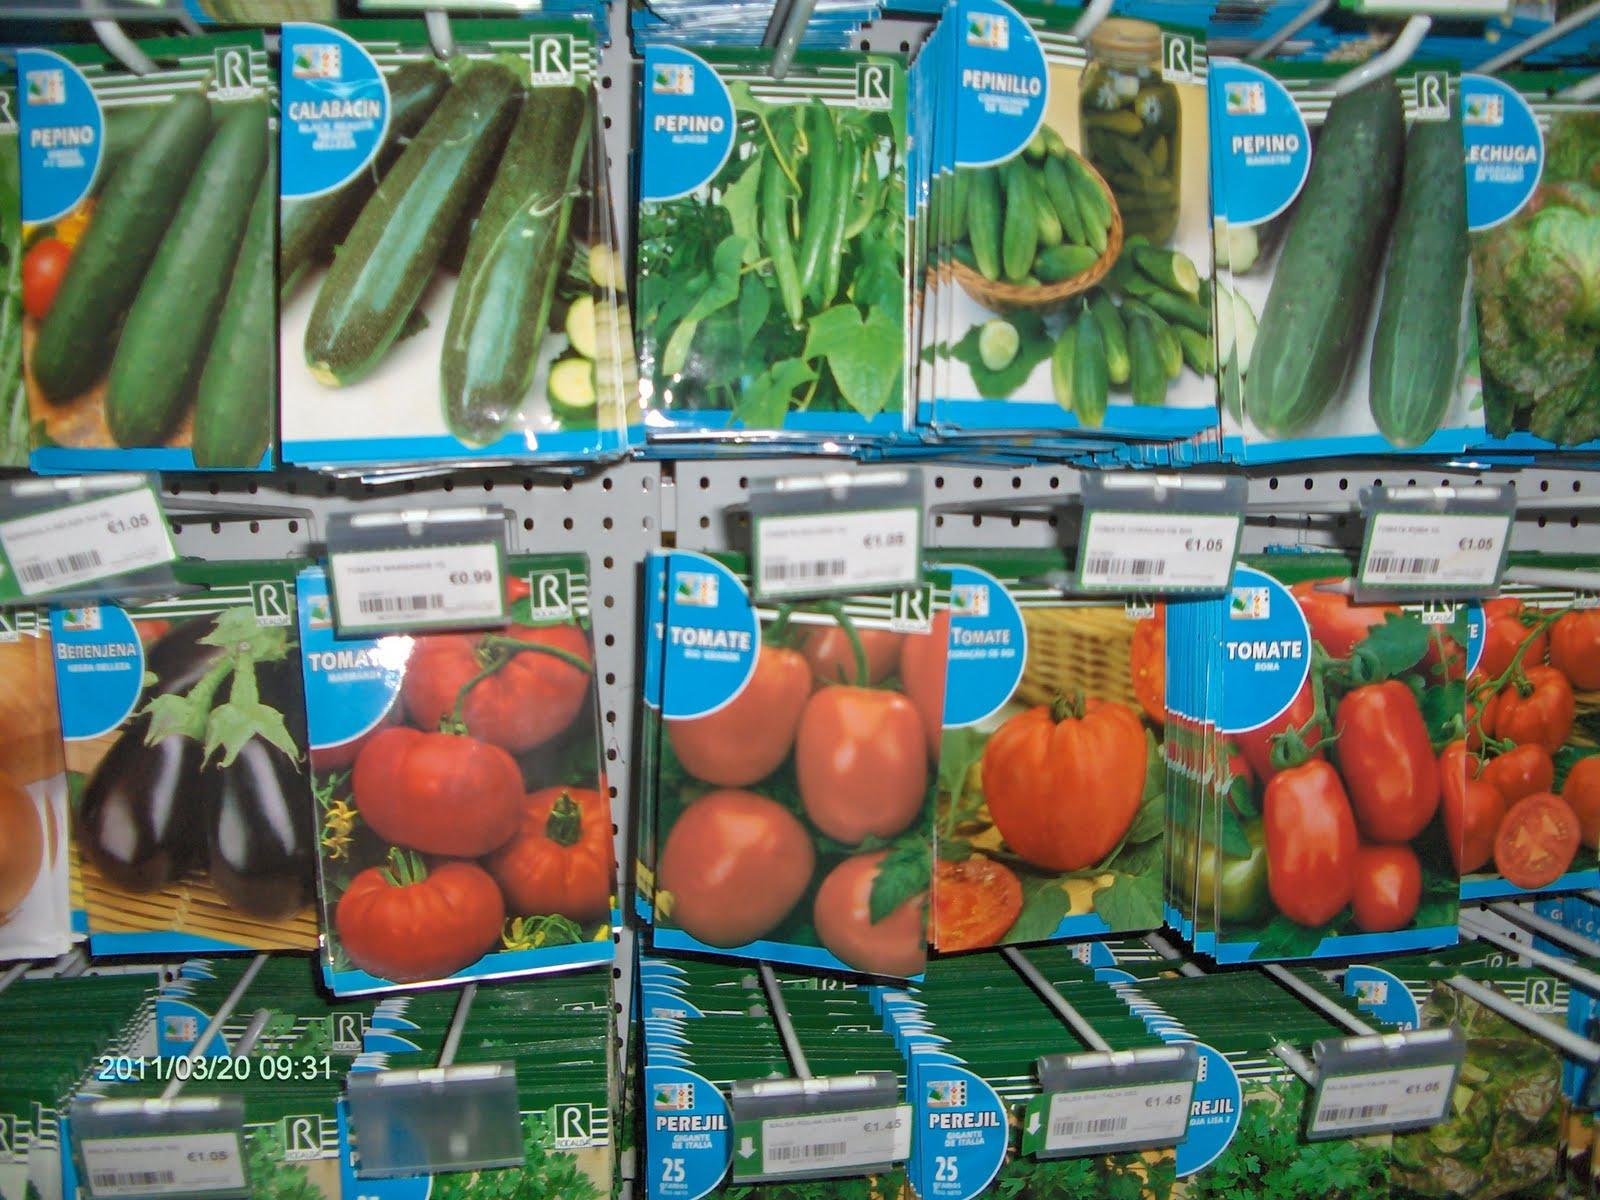 Well-known Terramanhada: Plantar tomateiros KP25